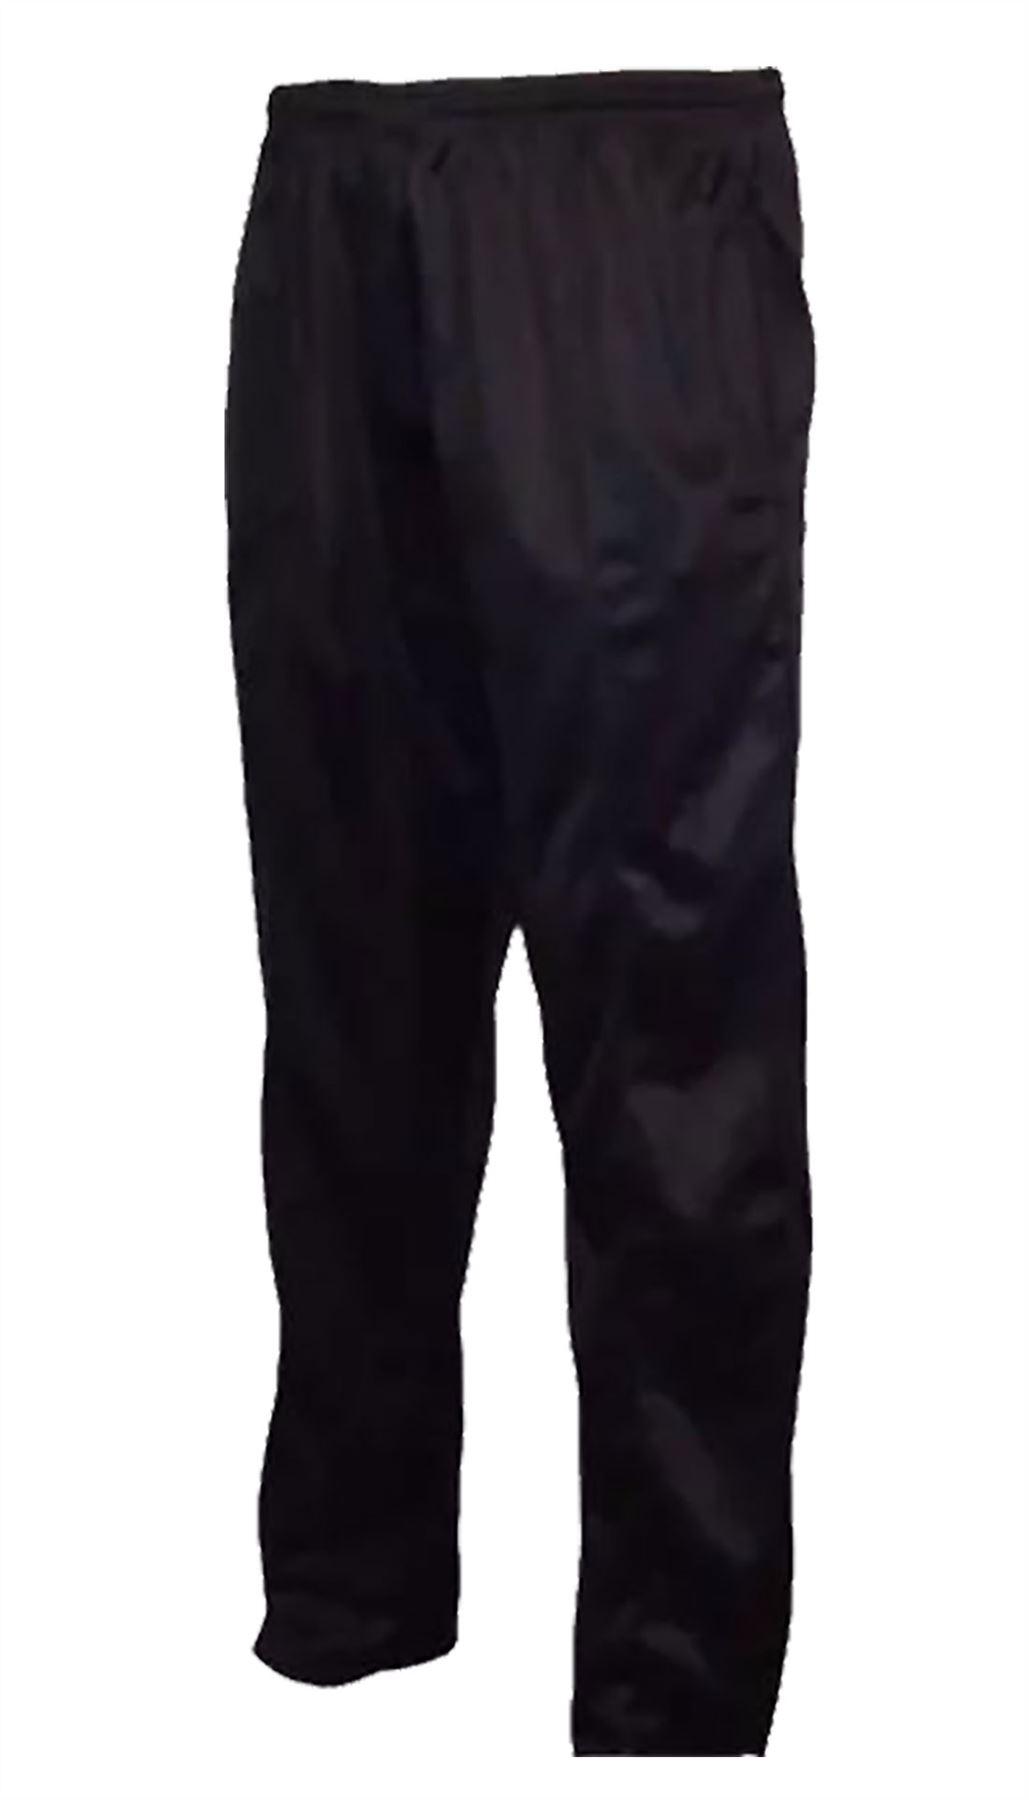 361c53e435c6 Storm Break Waterproof Over Sized Trousers Mens Womens Stretchy Rain ...